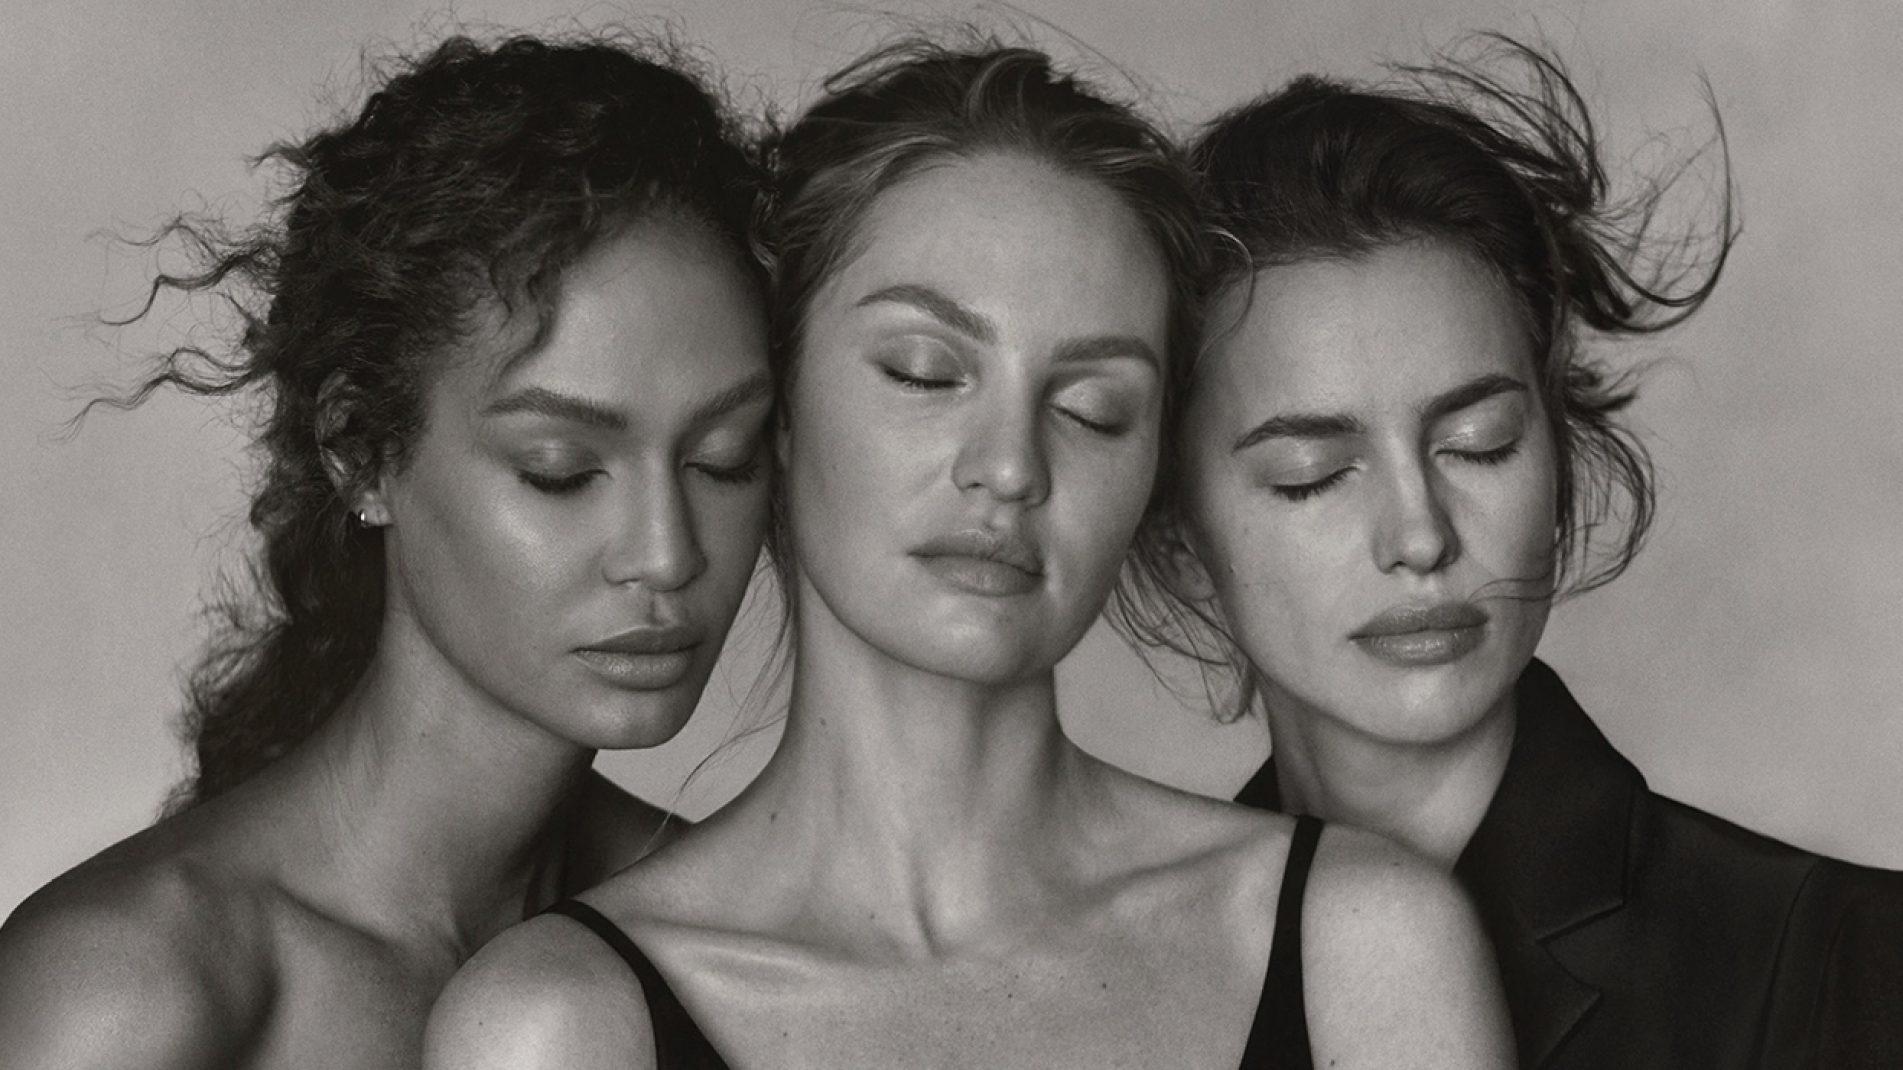 Irina Shayk, Joan Smalls και Candice Swanepoel στην Vogue Greece